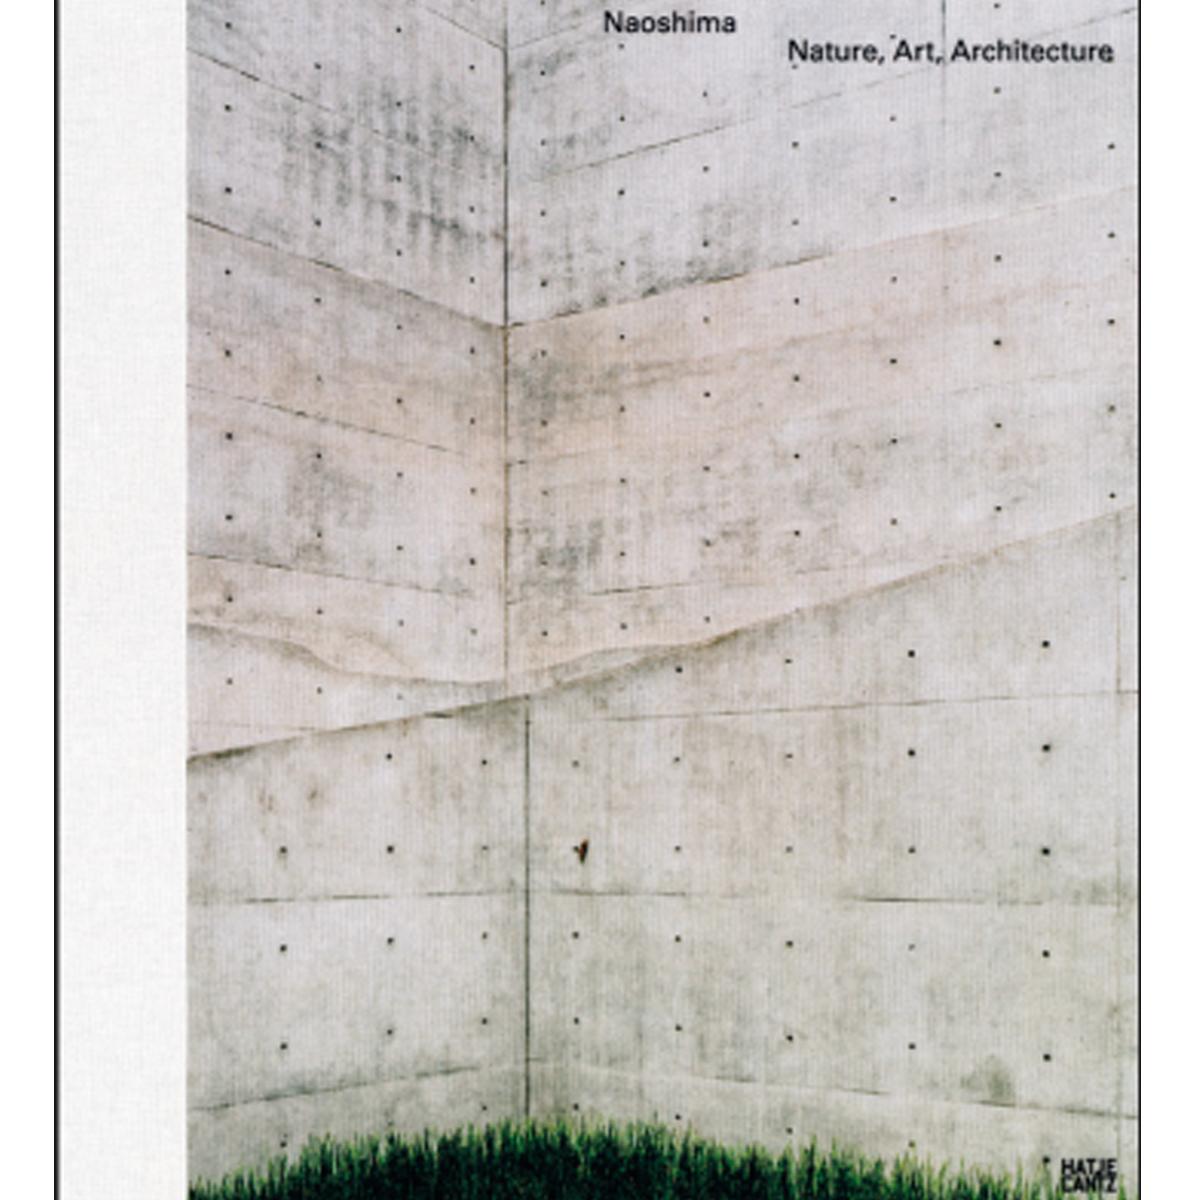 Naoshima. Nature, Art, Architecture